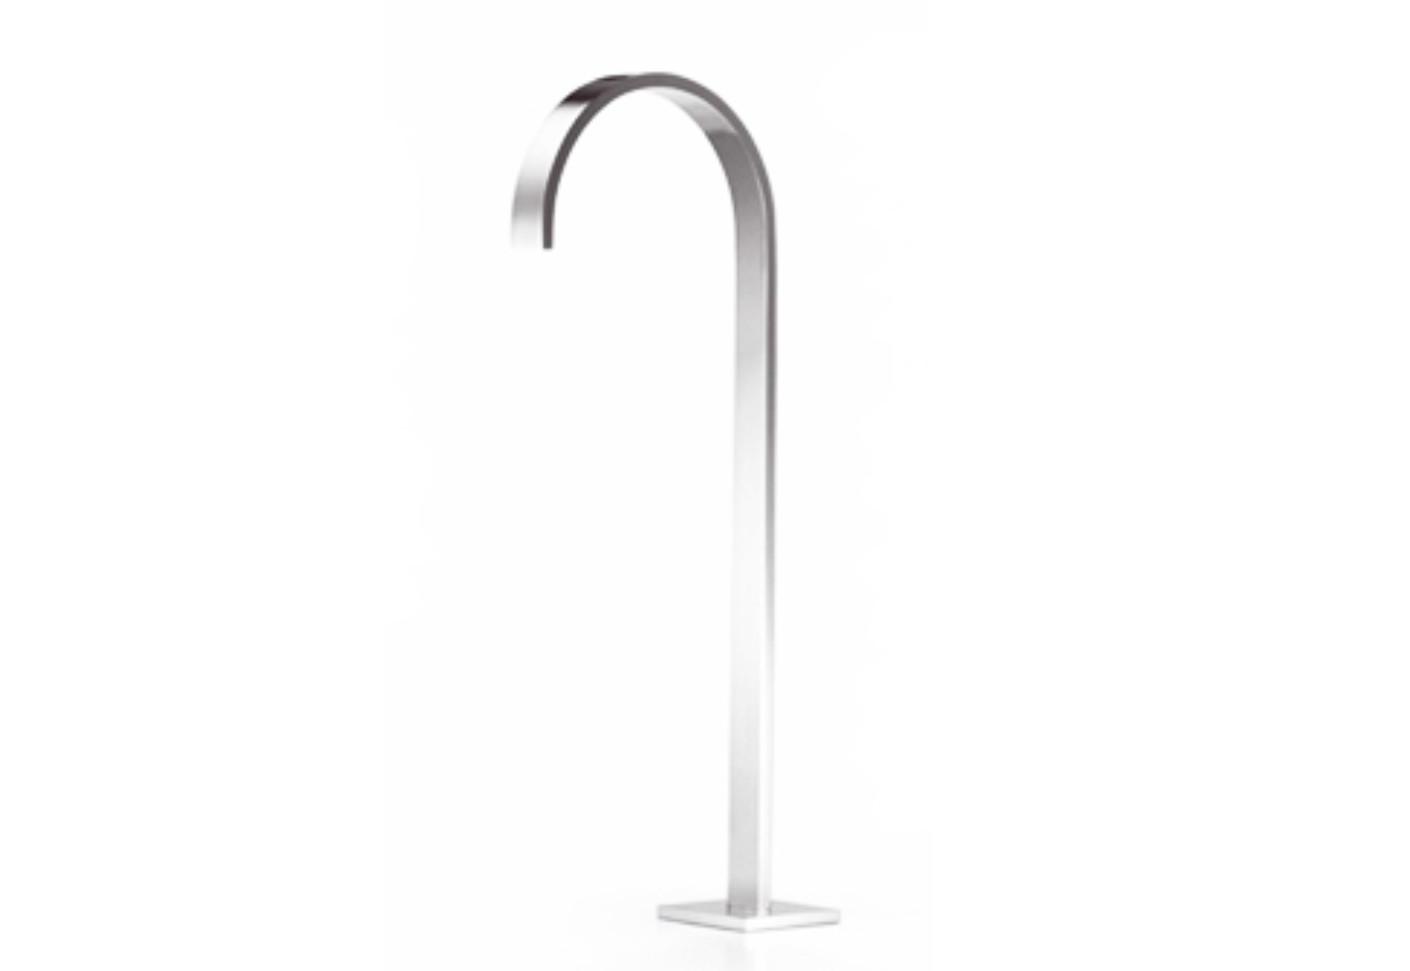 Ideas, mem bath spout for free standing assembly dornbracht stylepark for proportions 1410 x 971  .